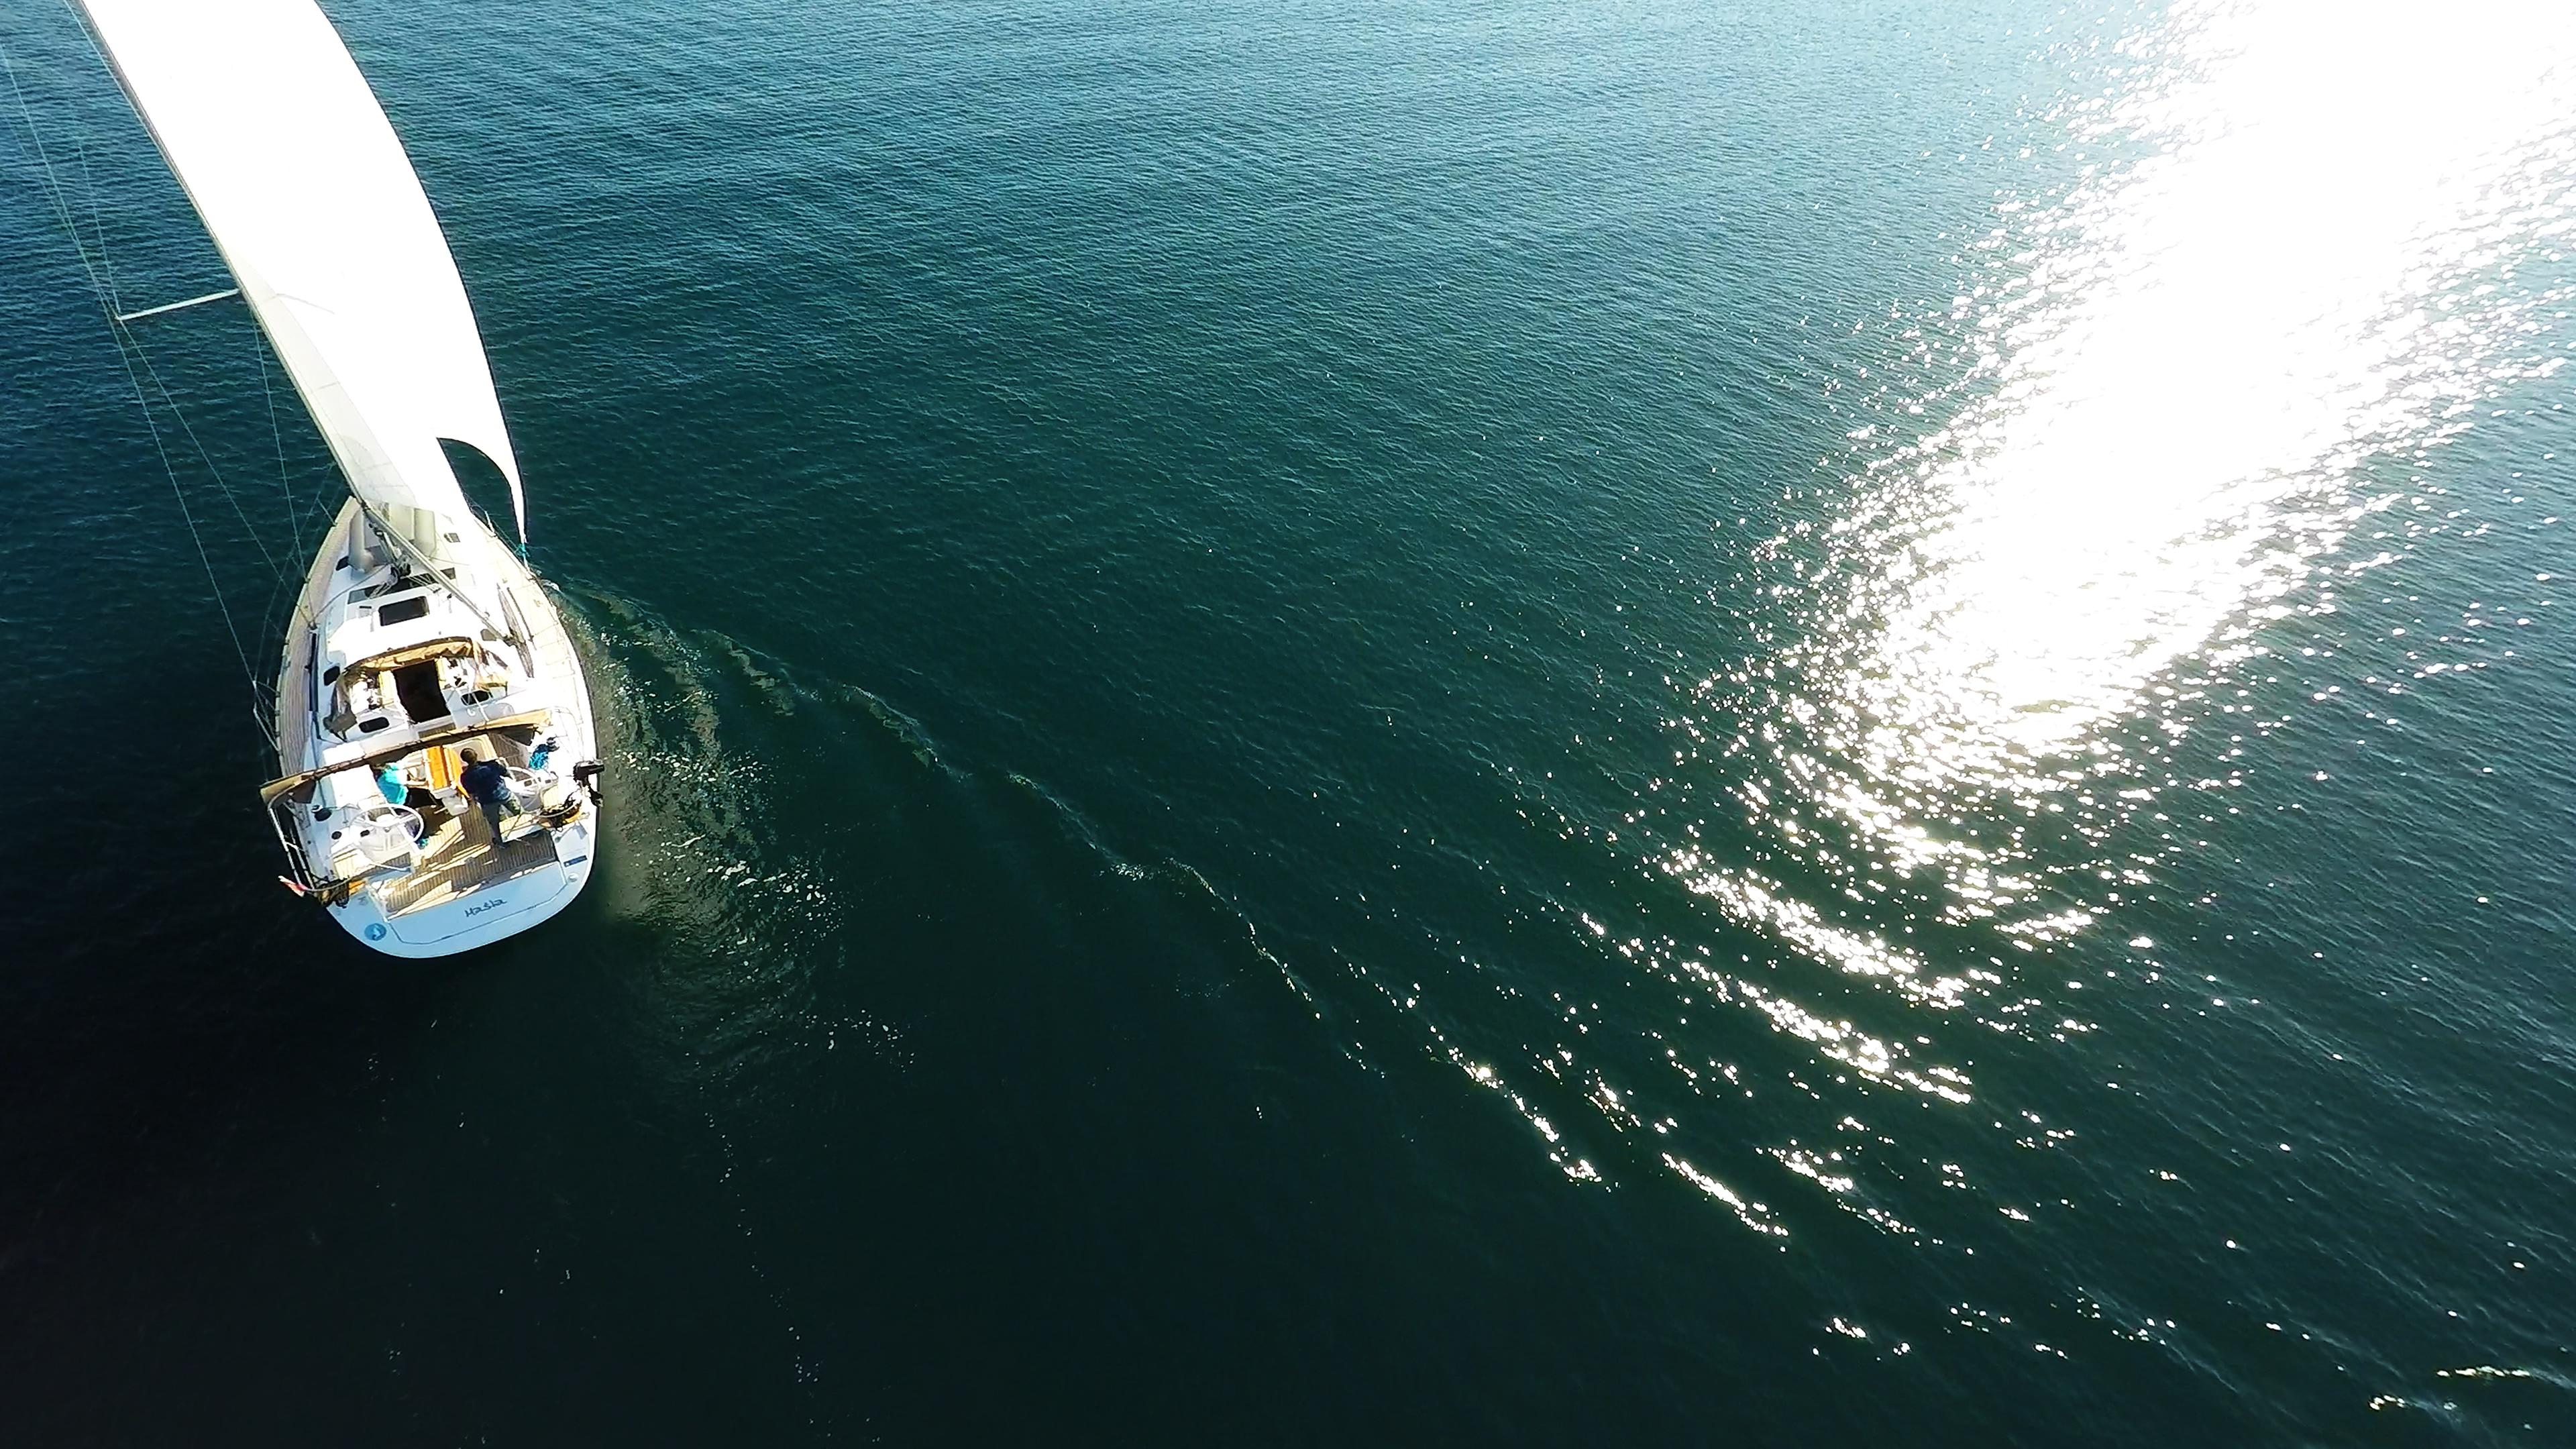 barcha a vela barca a velaal mare riflesso del sole yacht a vela